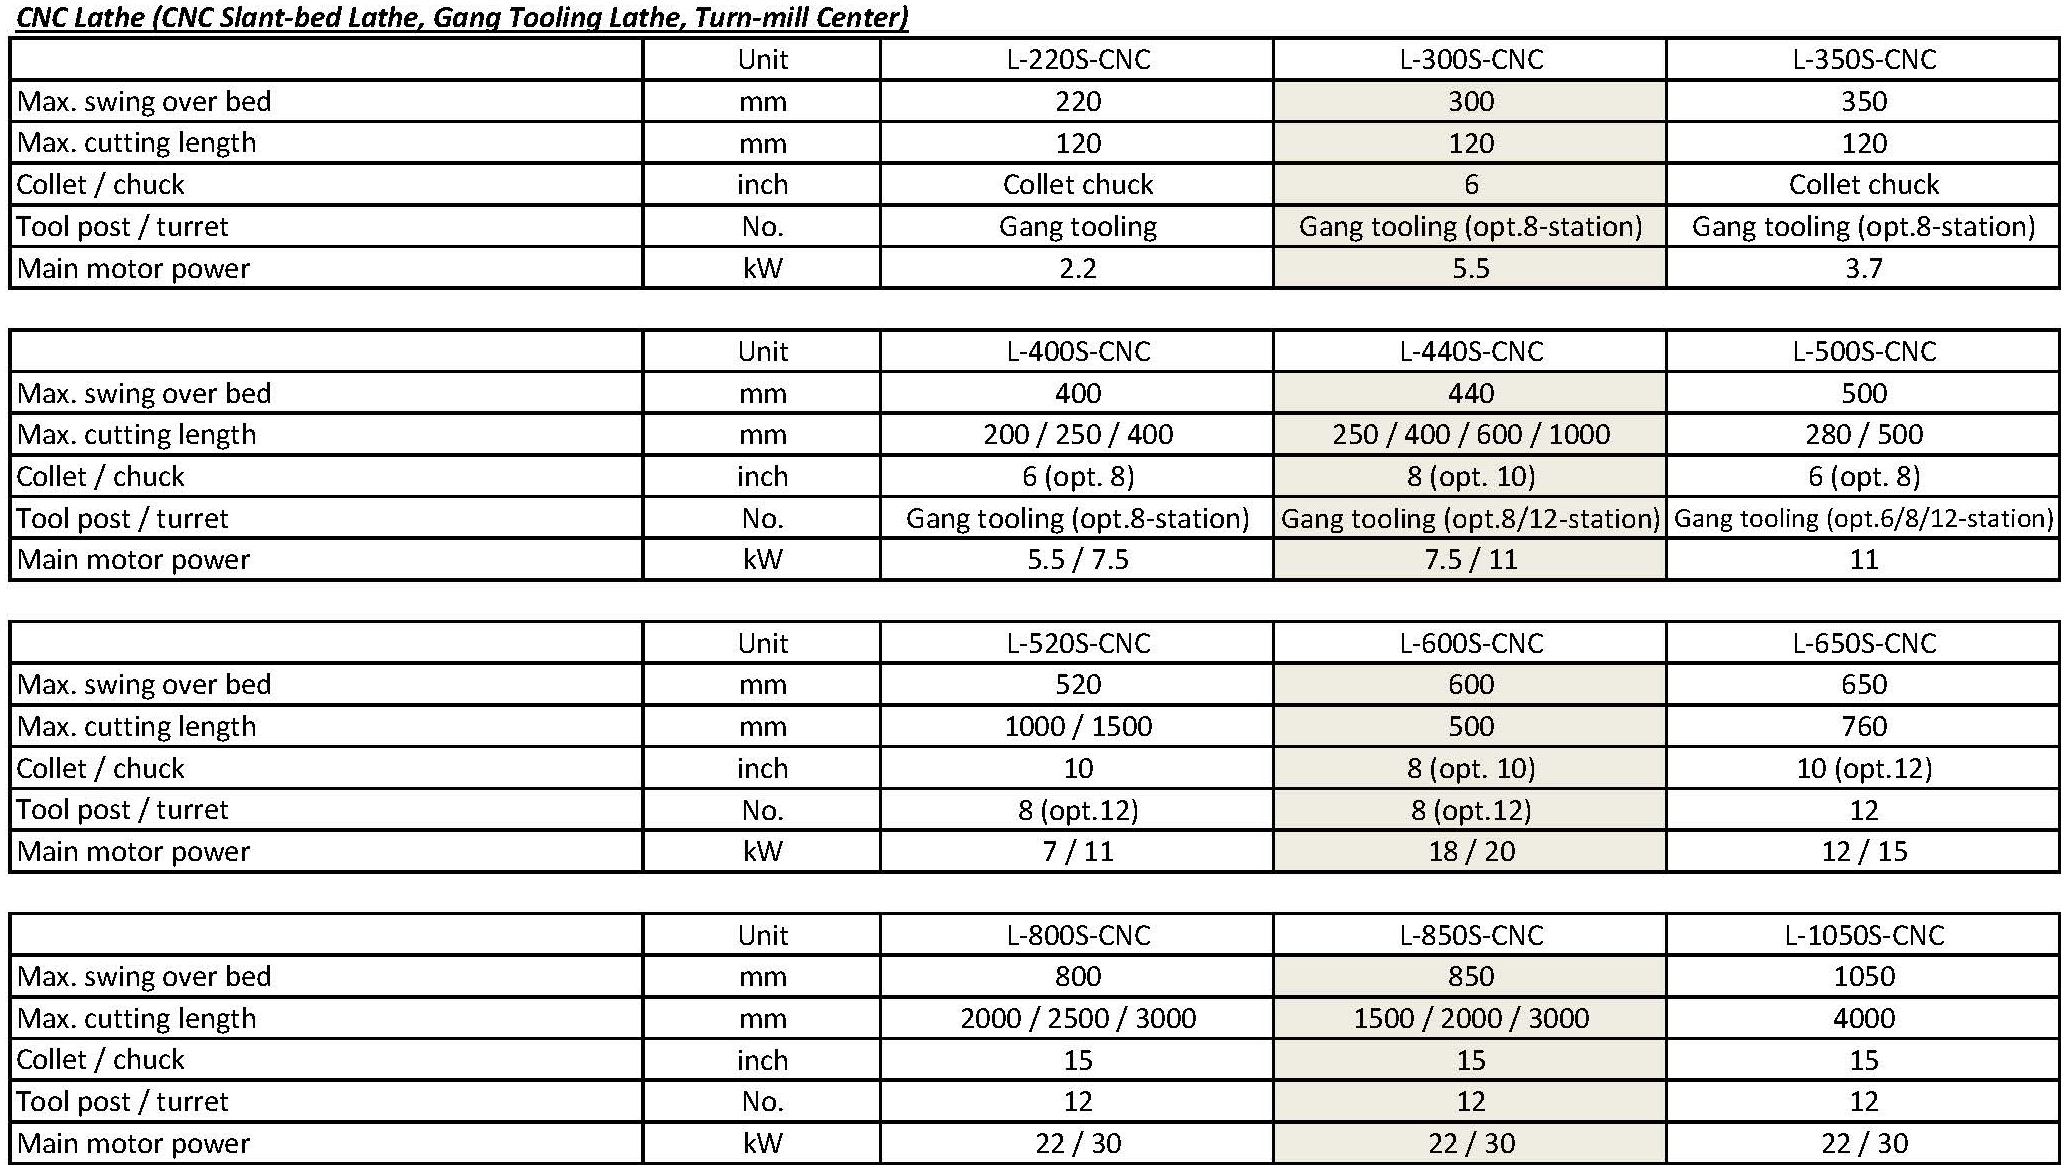 技术参数 - LS-CNC